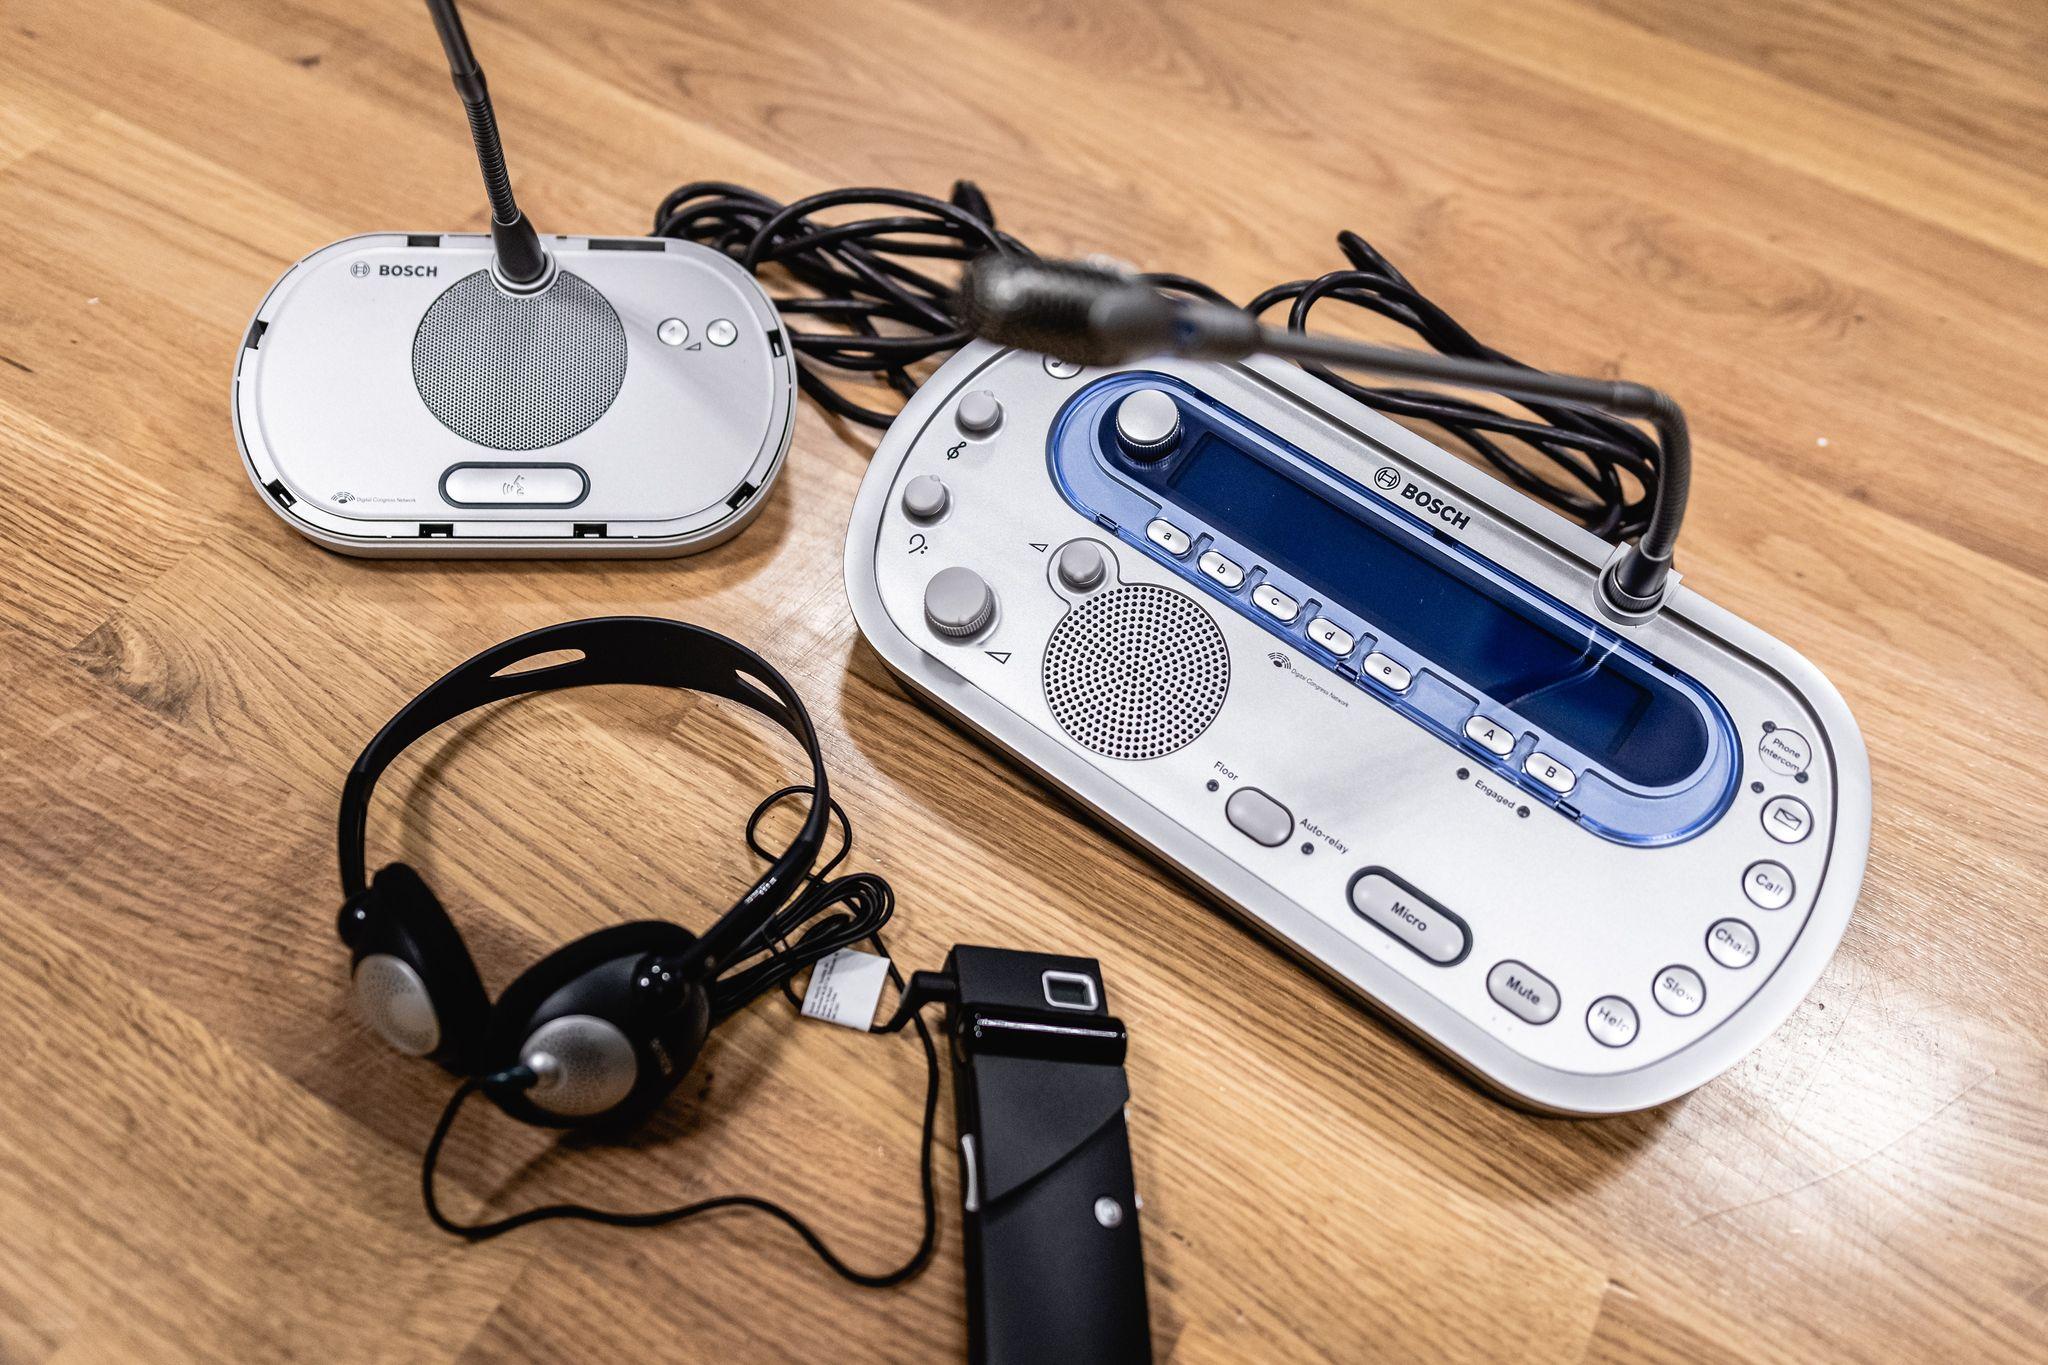 Nabava informatičko-komunikacijske i audio-video opreme za ABC centar